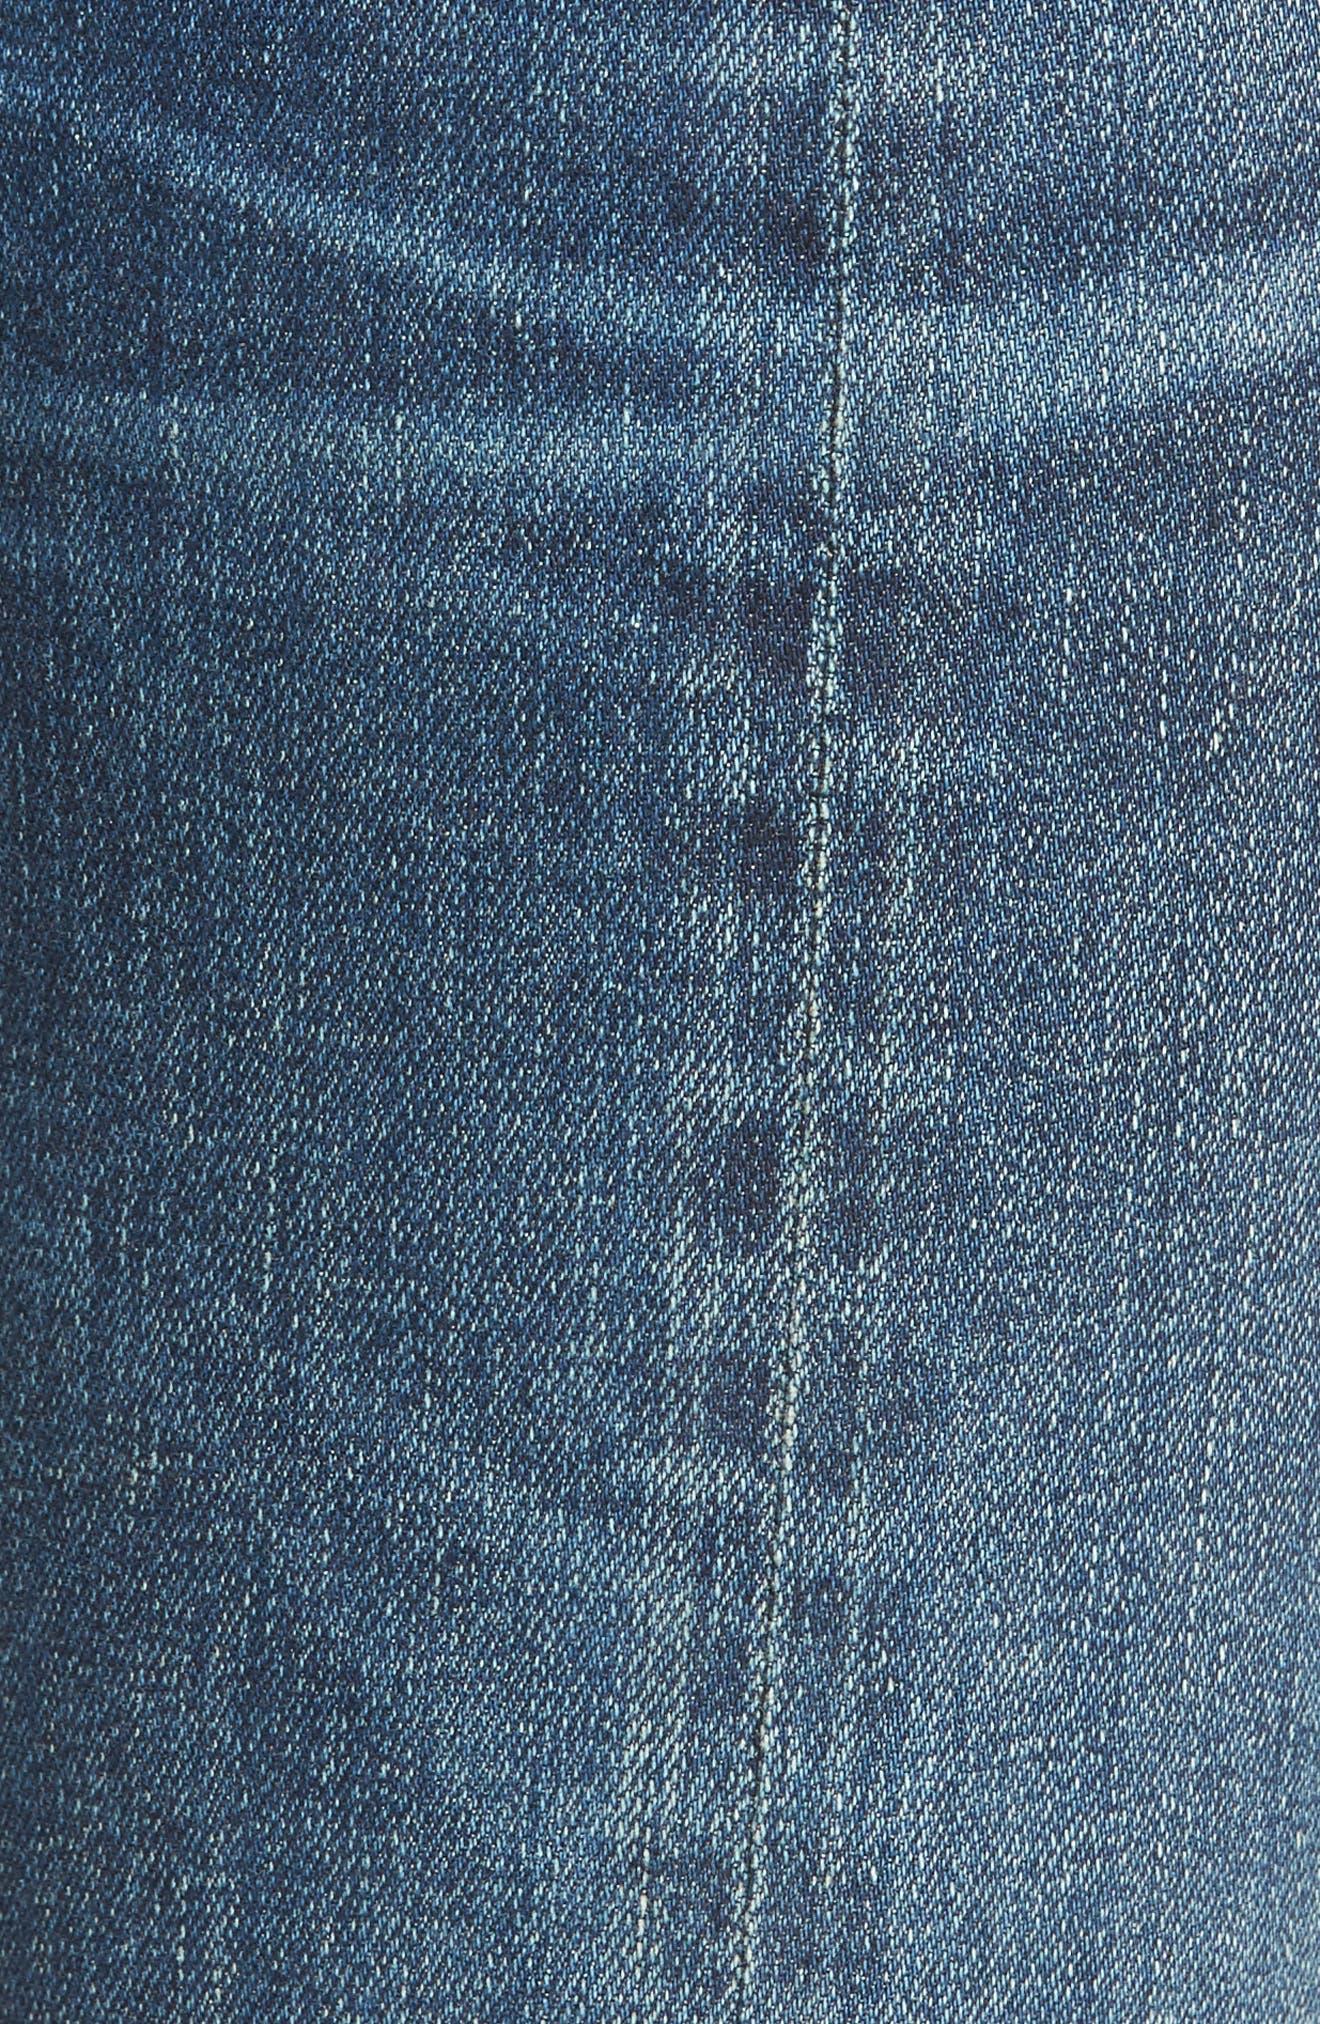 Amari Step Hem Ankle Jeans,                             Alternate thumbnail 5, color,                             429